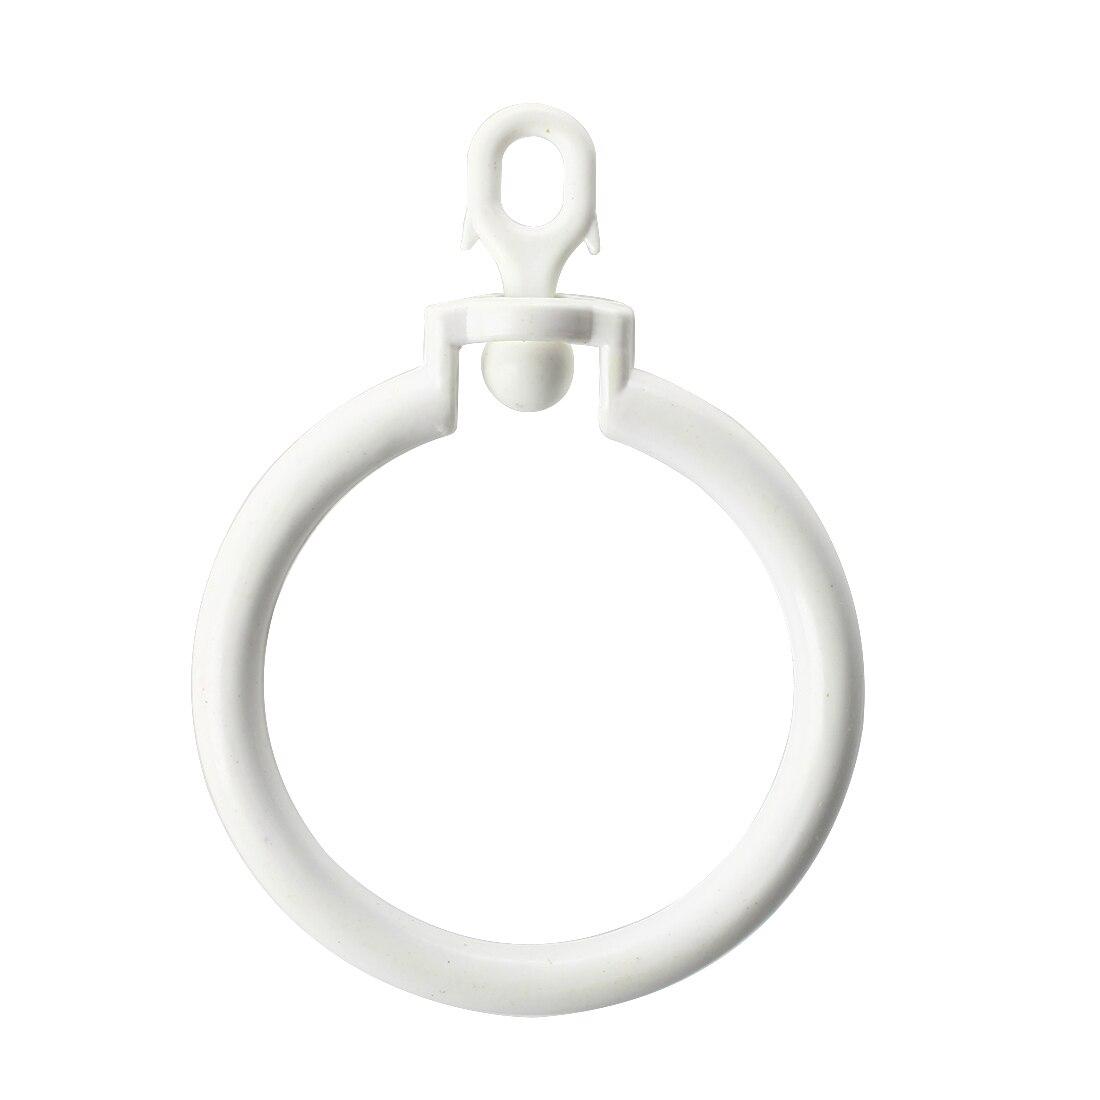 MYLB-3 PCS Curtain Rod Rings with Eyelets White